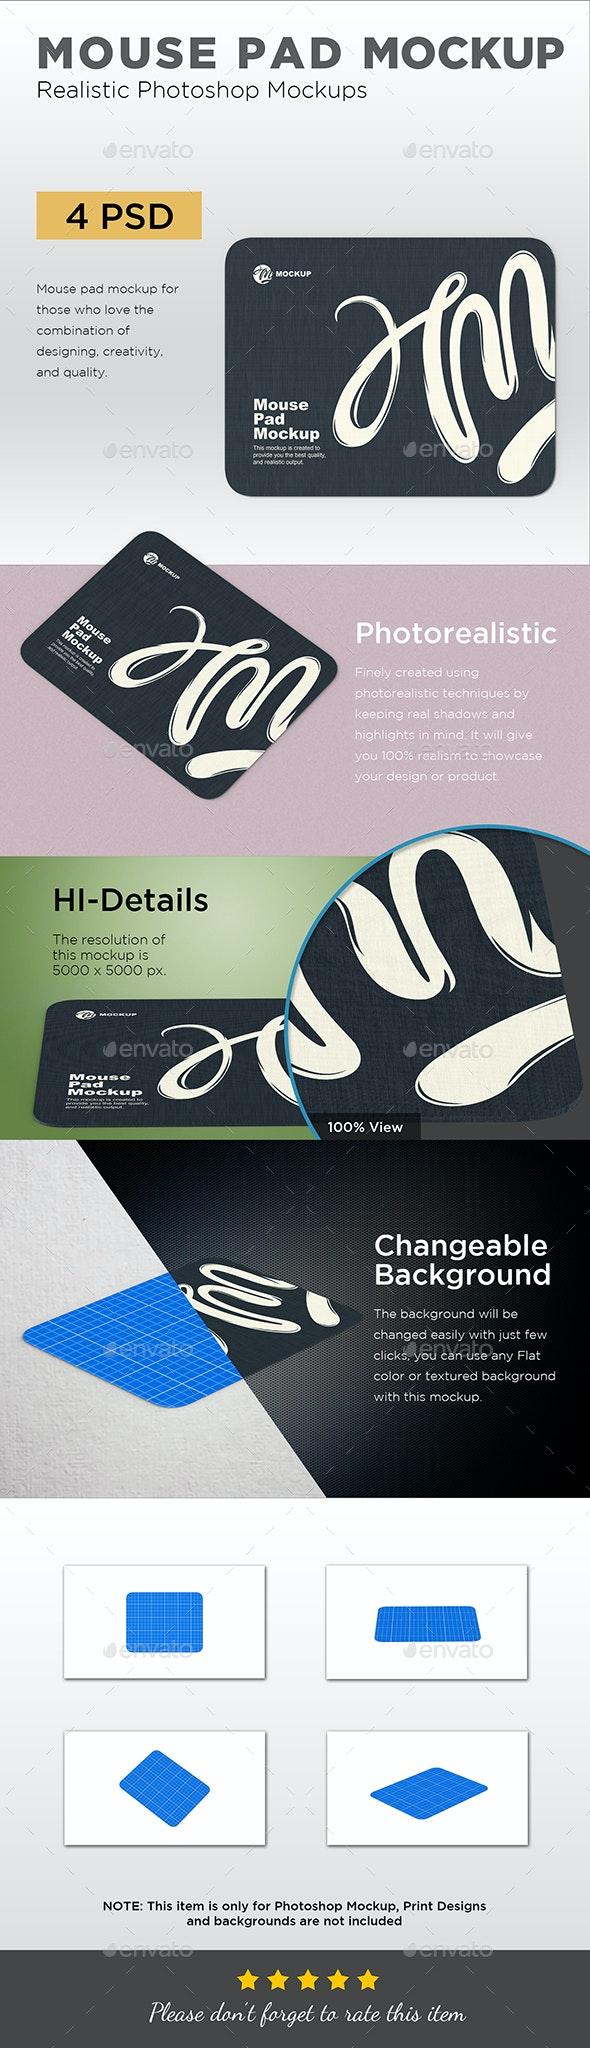 Mouse Pad Mockup - Displays Product Mock-Ups